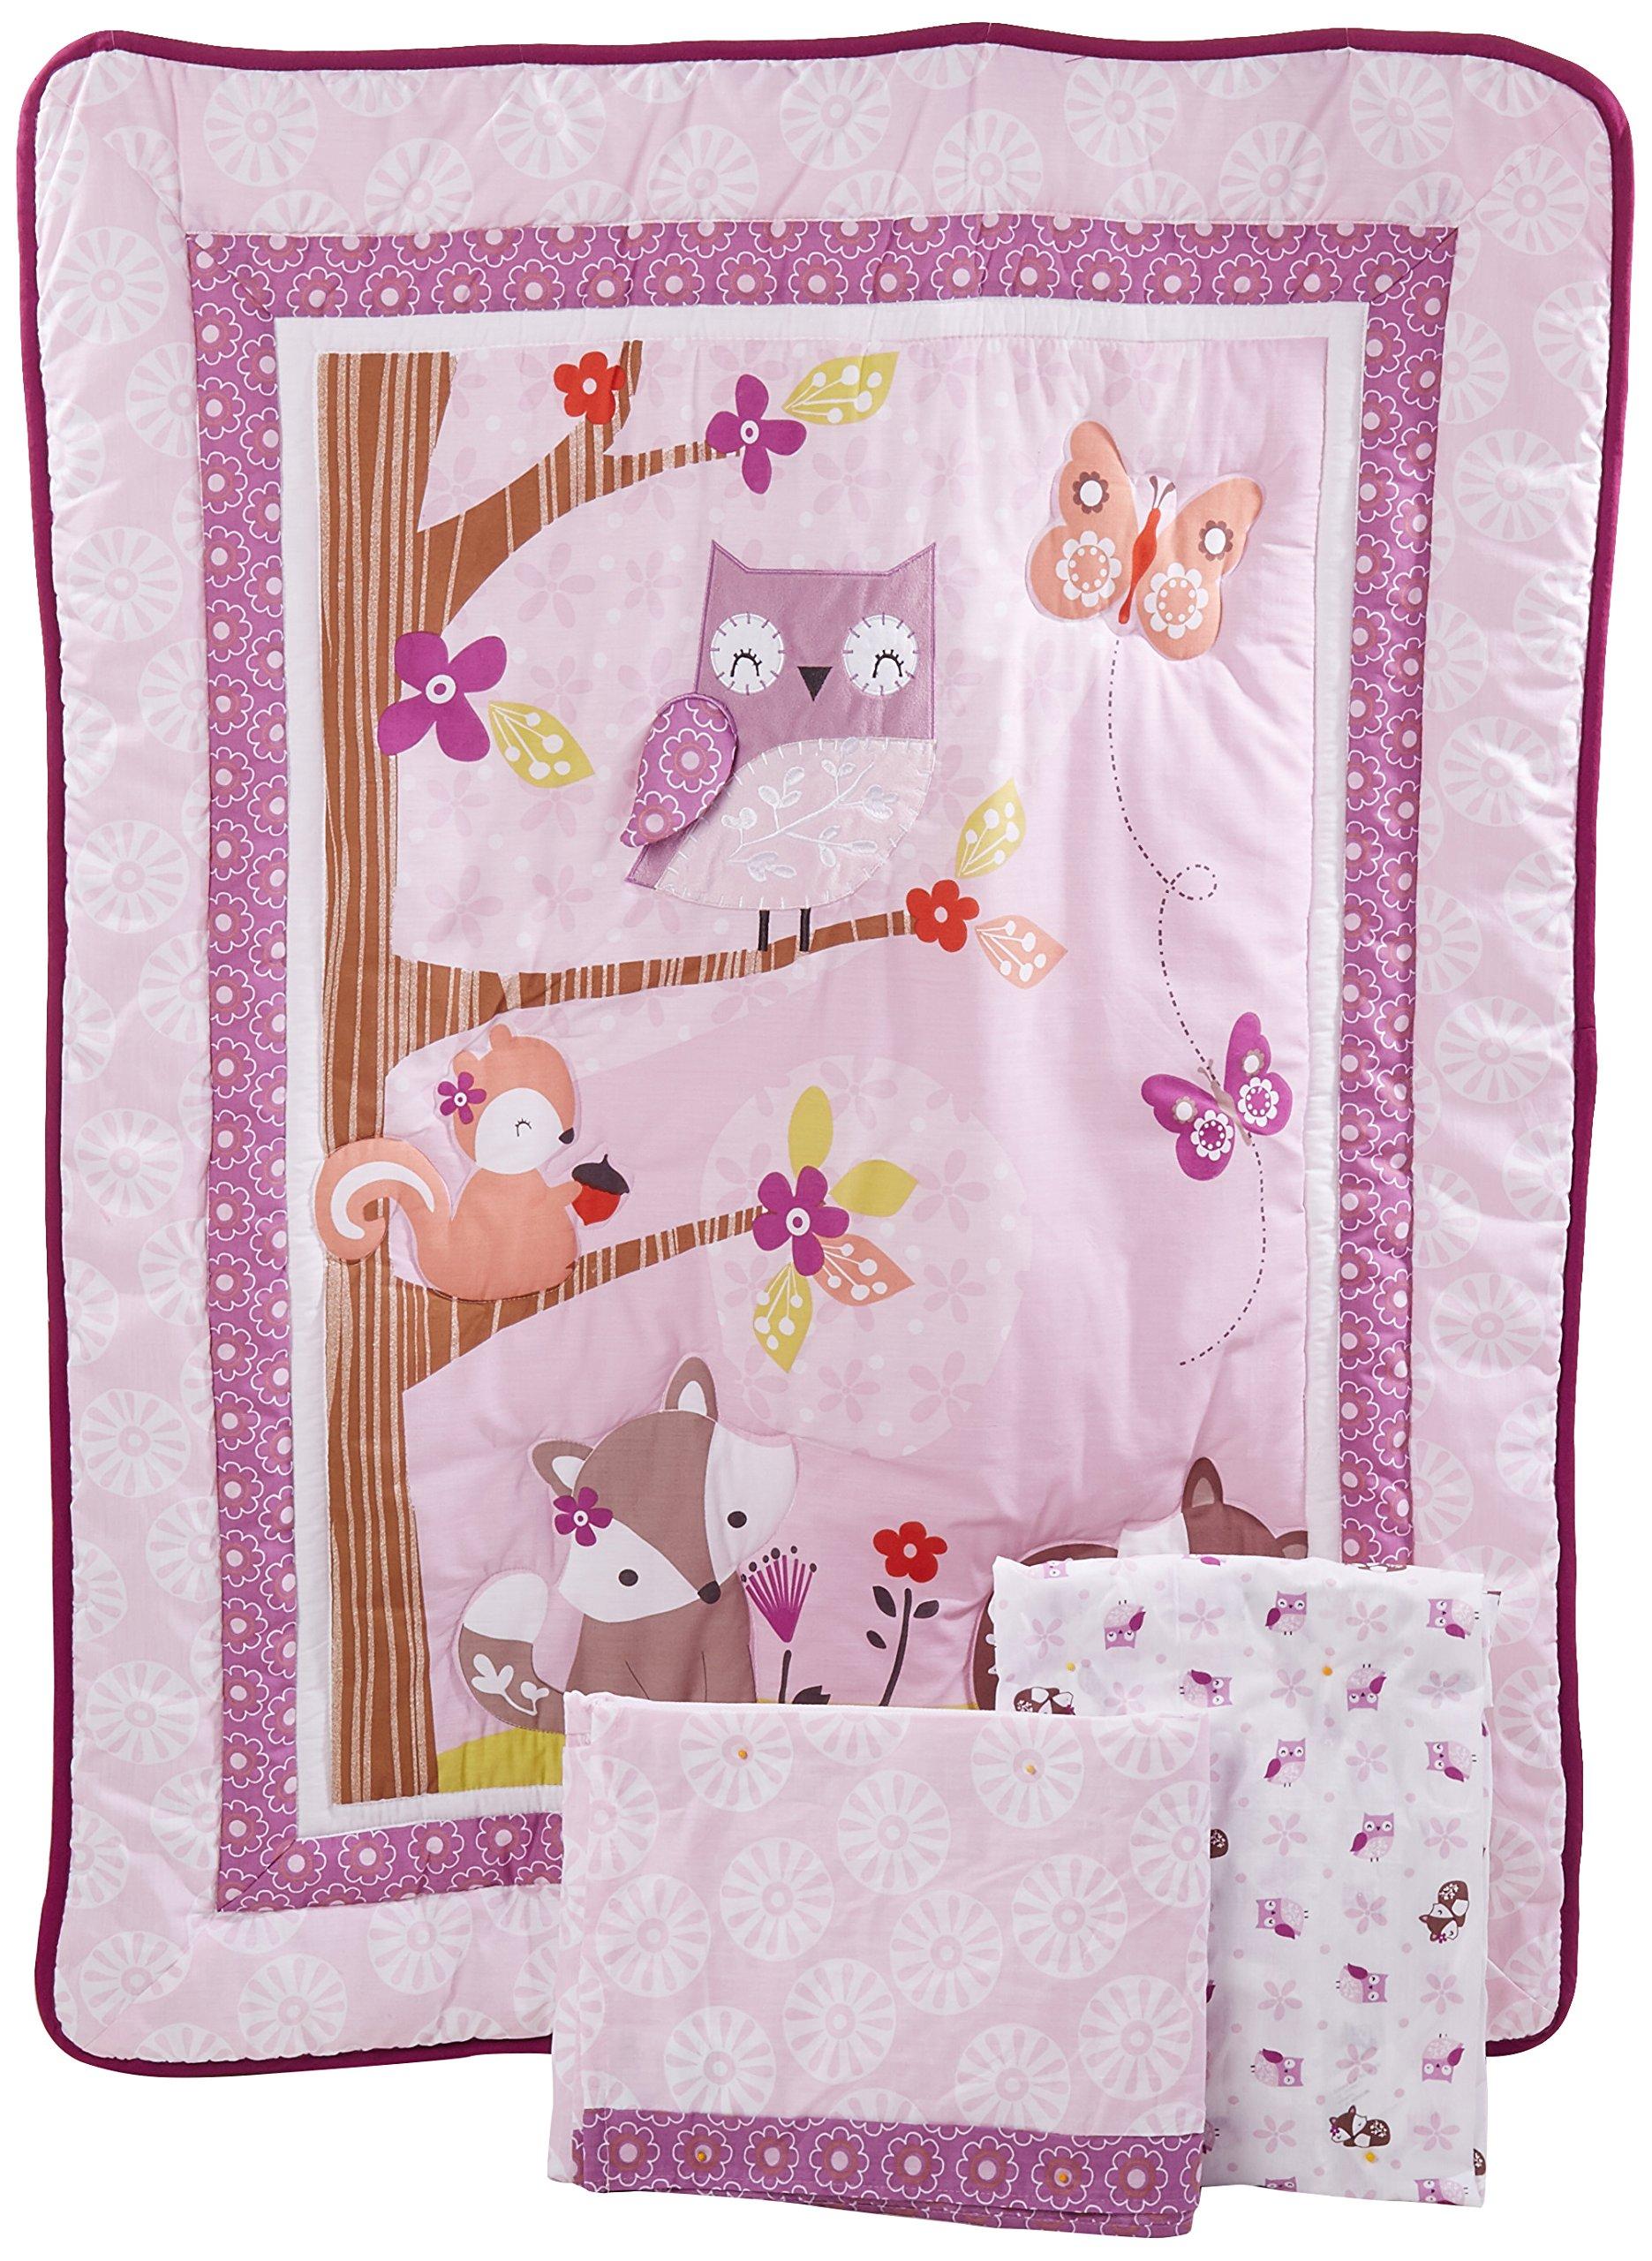 Bedtime Originals Lavender Woods 3 Piece Bedding Set